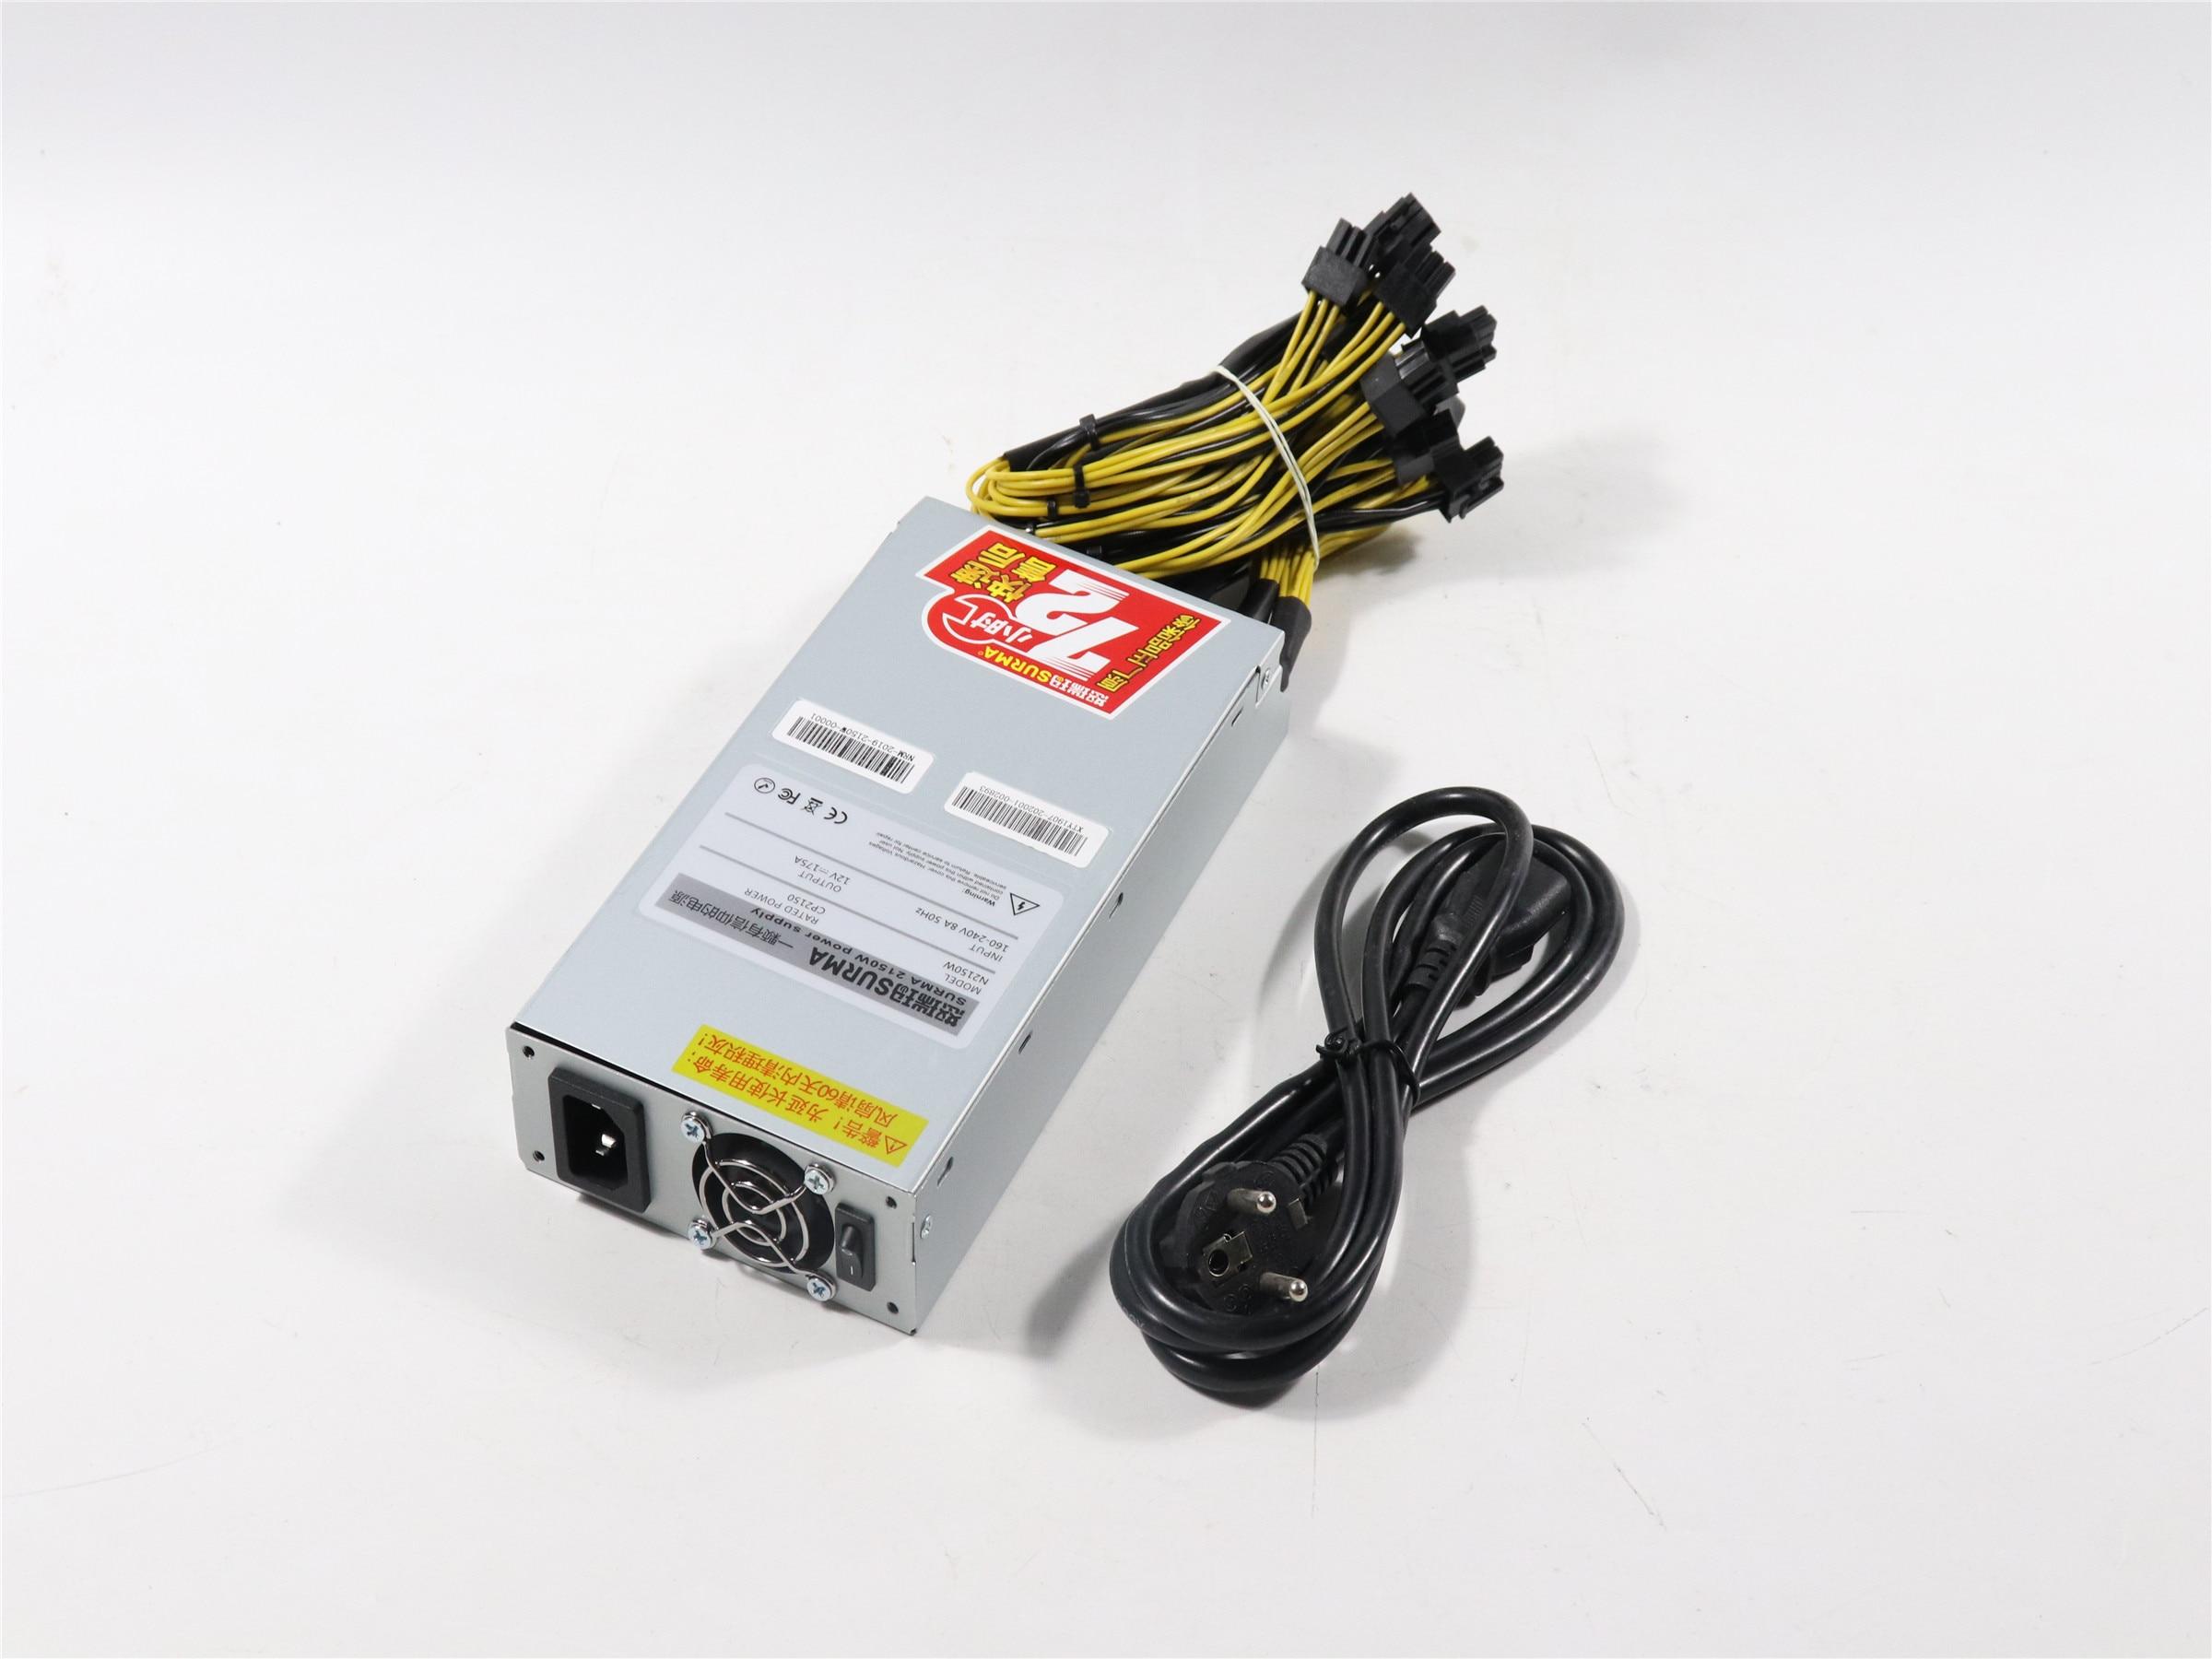 Nouveau ZEC BTC LTC DASH Miner PSU 2150W alimentation pour Antminer S9 S9j S9k S9 SE L3 + E3 Z9 Z11 T9 Innosilicon A9 Ebit E9i ETH PSU